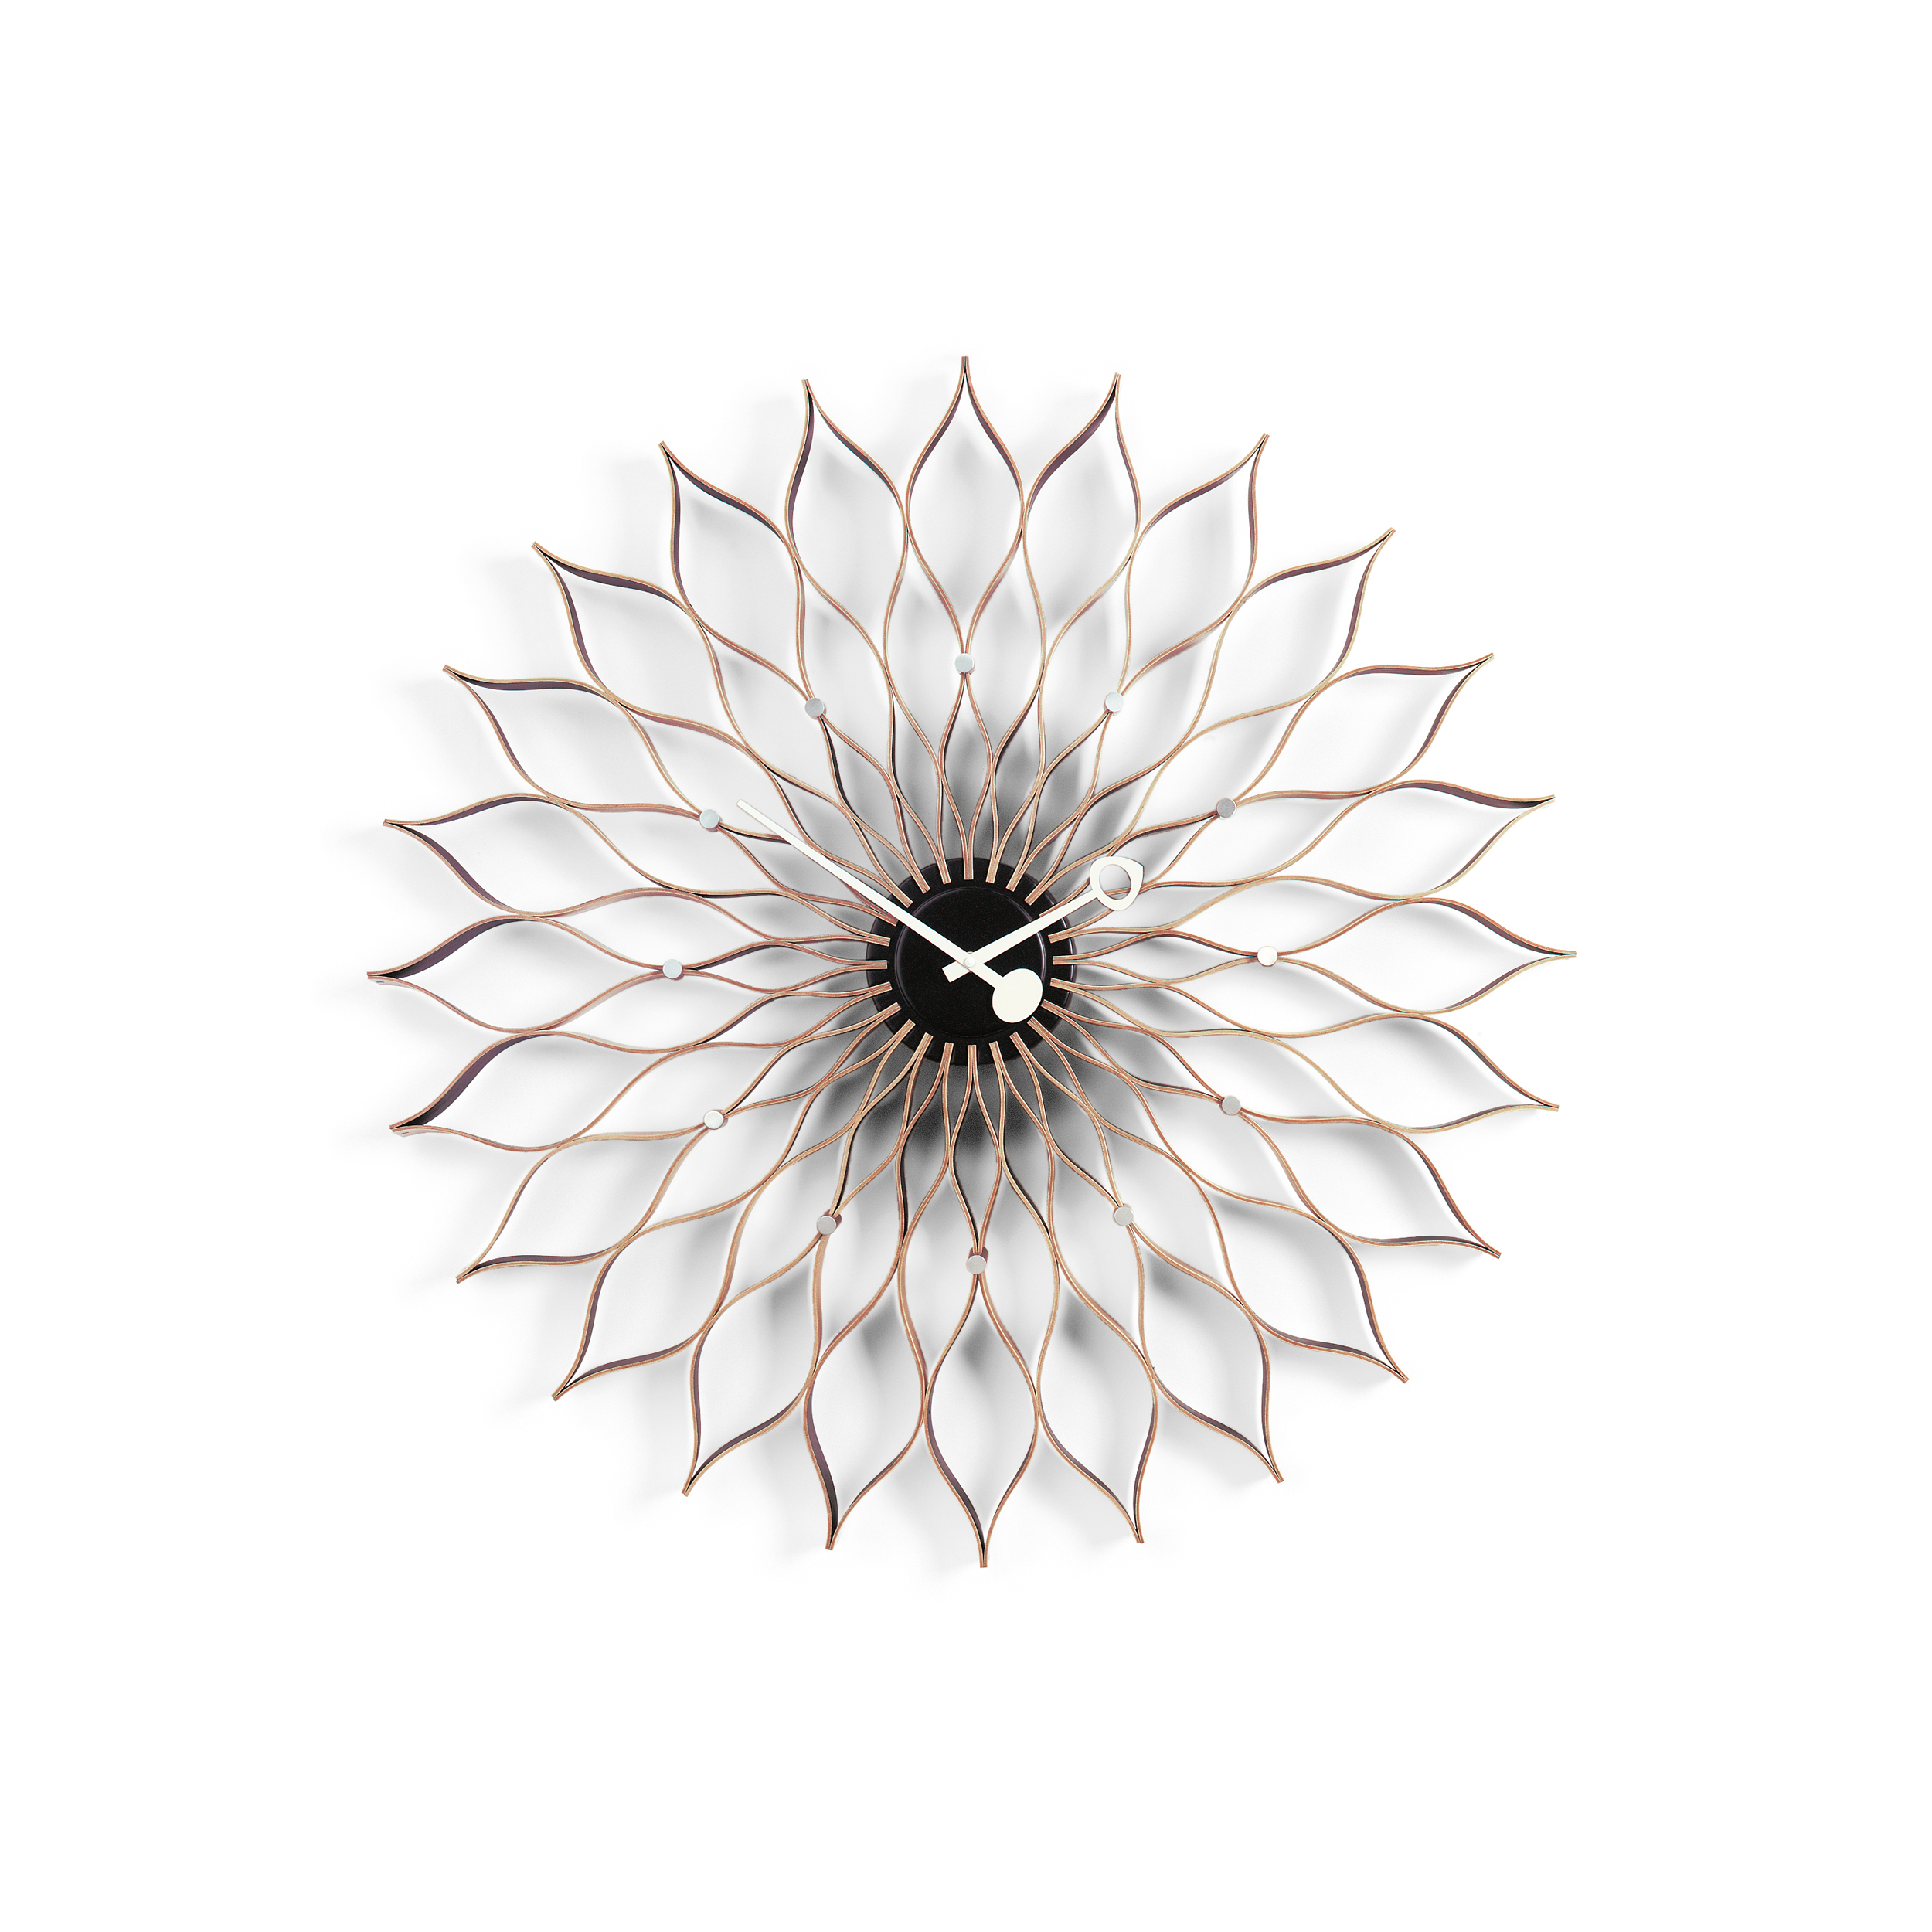 vitra wanduhr sunflower clock von george nelson. Black Bedroom Furniture Sets. Home Design Ideas